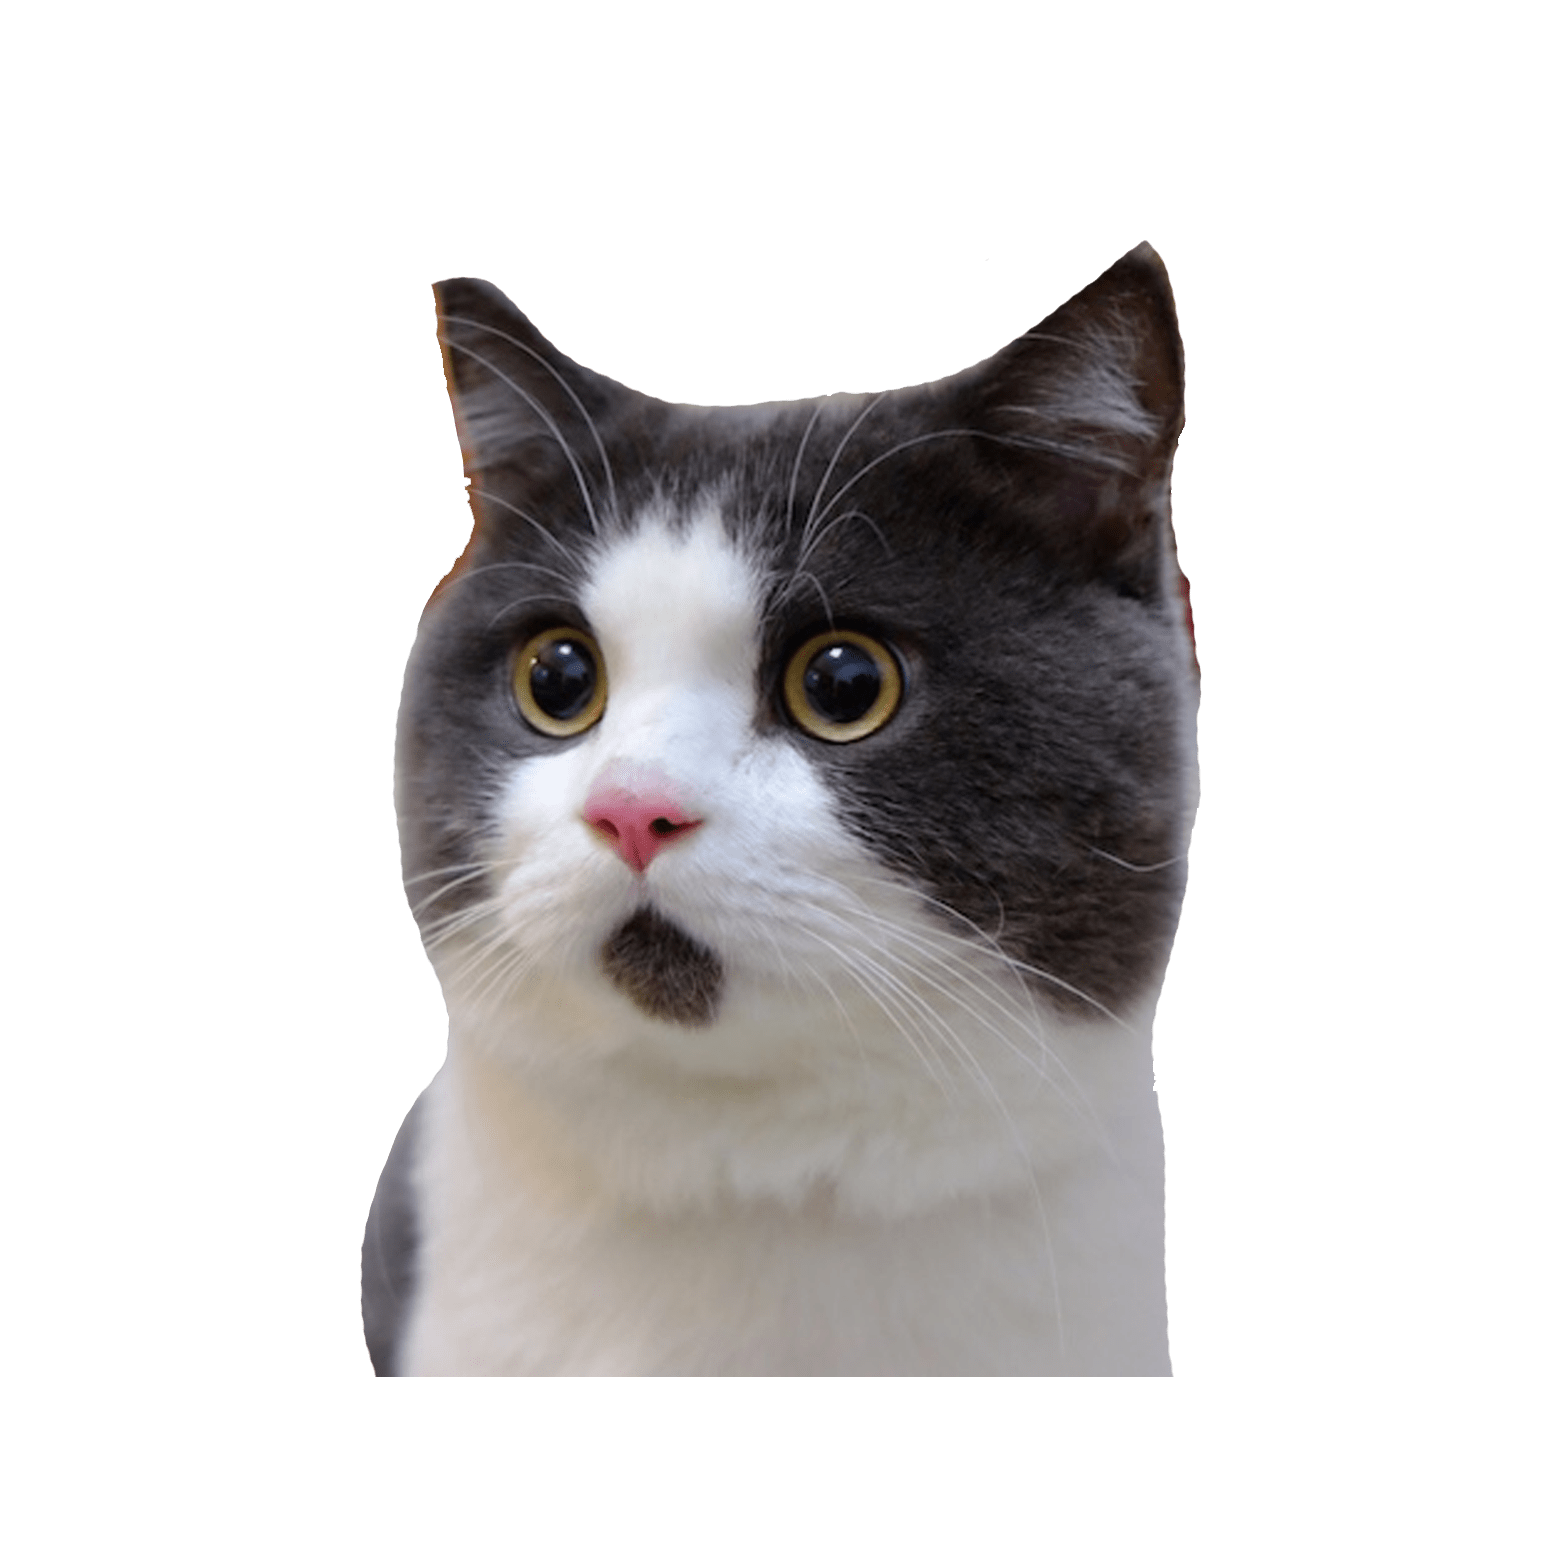 4a0582dada3 Cats transparent PNG images - StickPNG